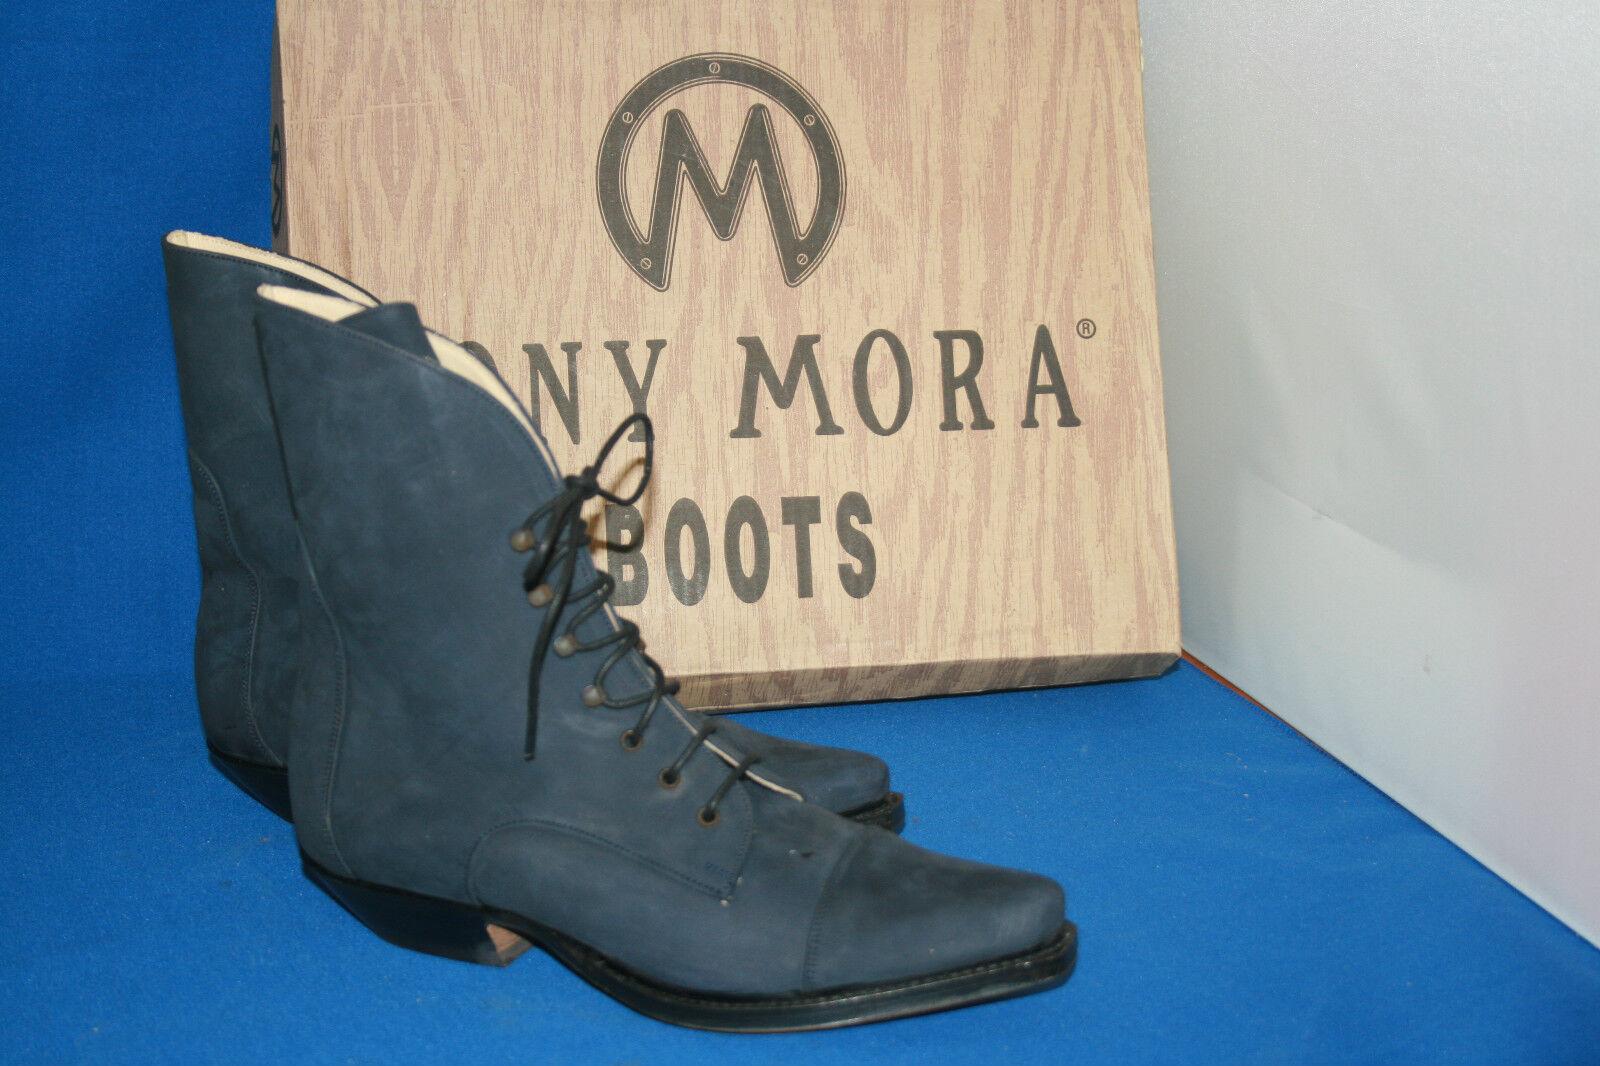 Tony Mora stiefelette blue westernstyle cowboystiefel boots gr. 38 neu  leder